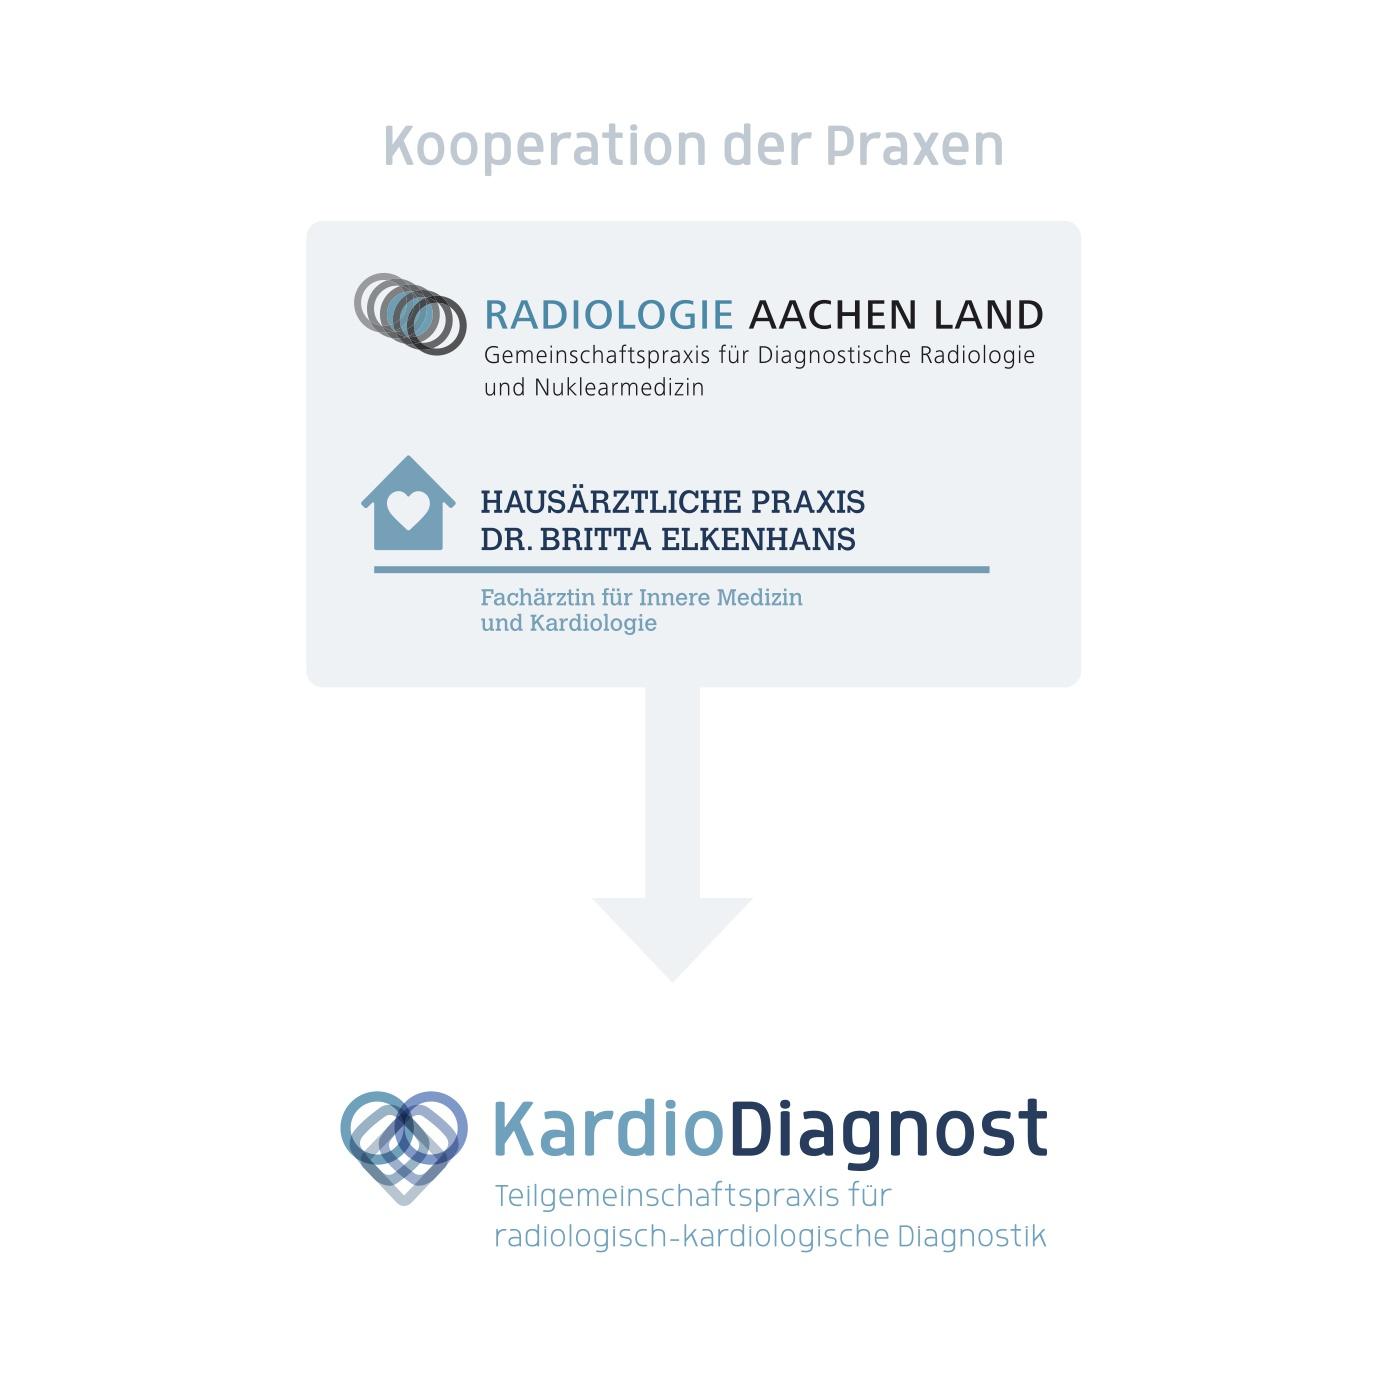 kardio_diagnost_05.jpg